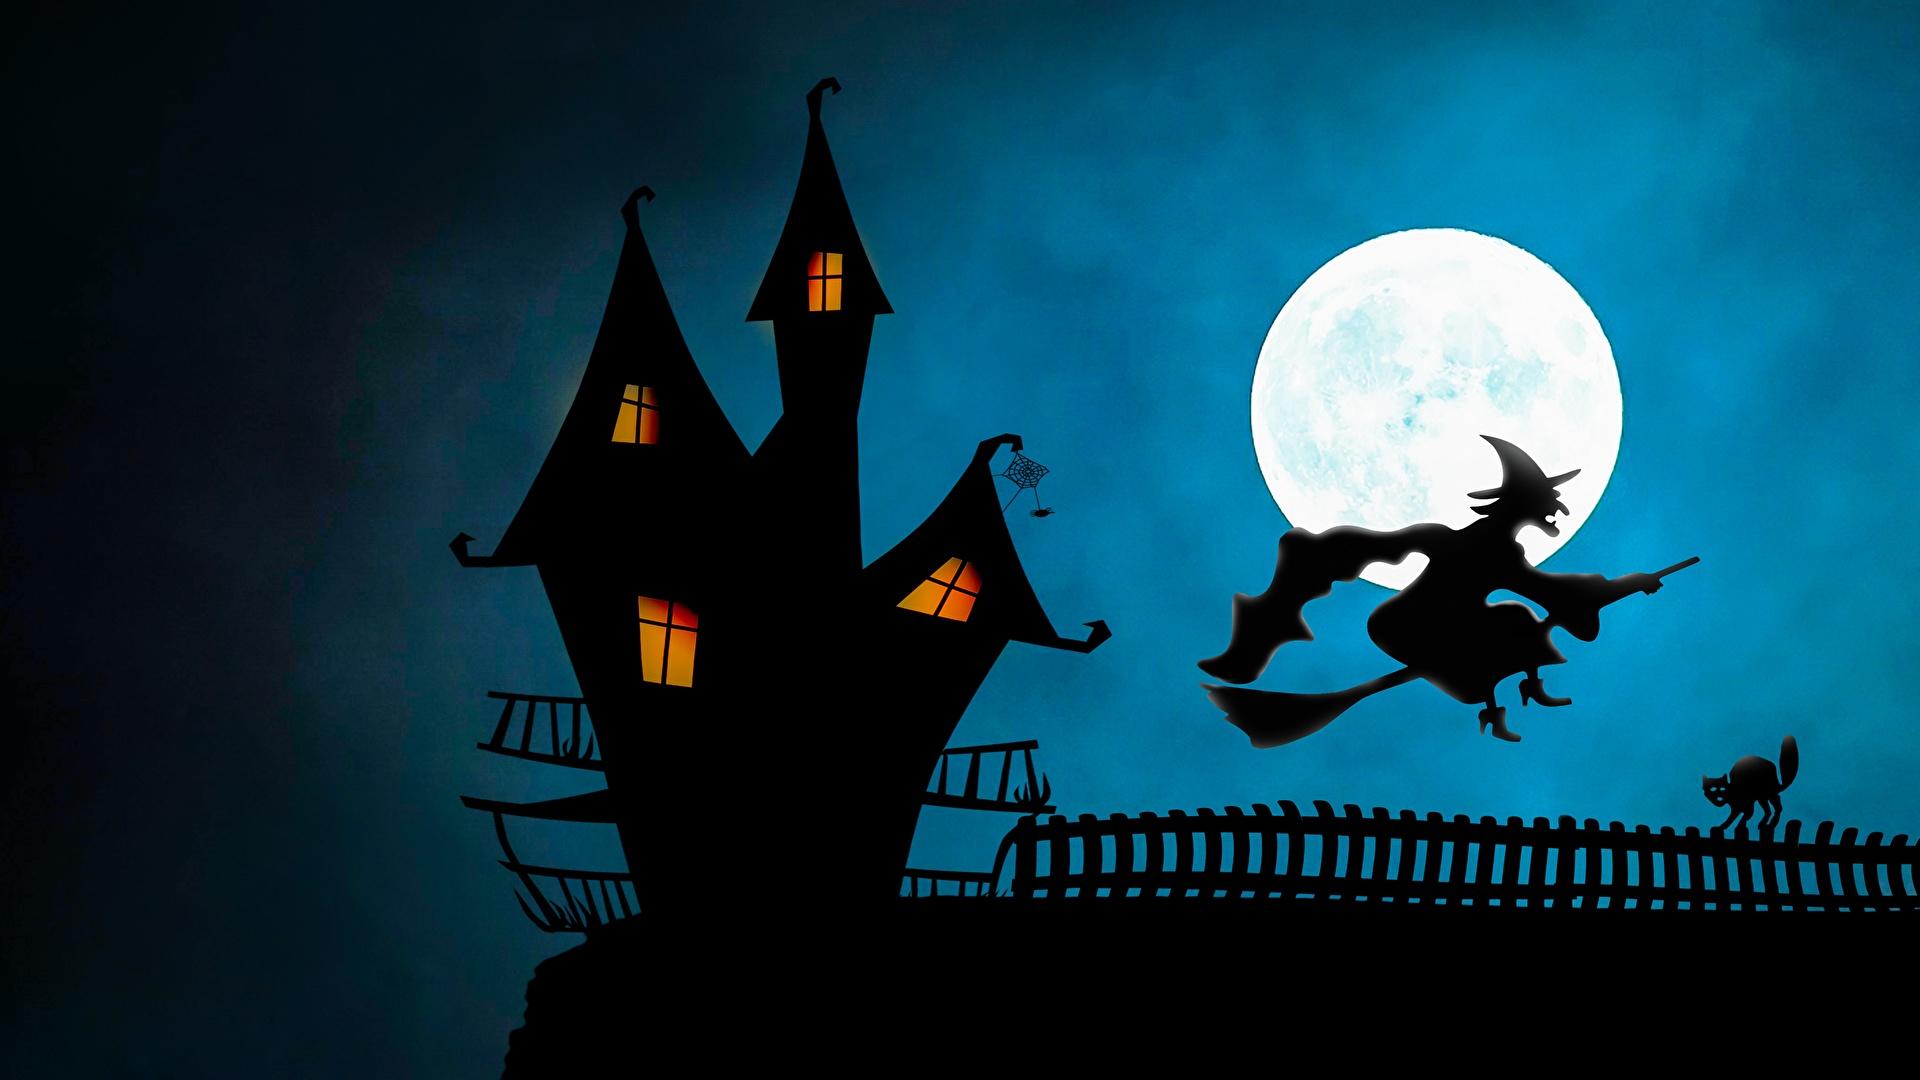 Картинки Хэллоуин Ведьма силуэта Замки луны 1920x1080 Силуэт силуэты Луна луной